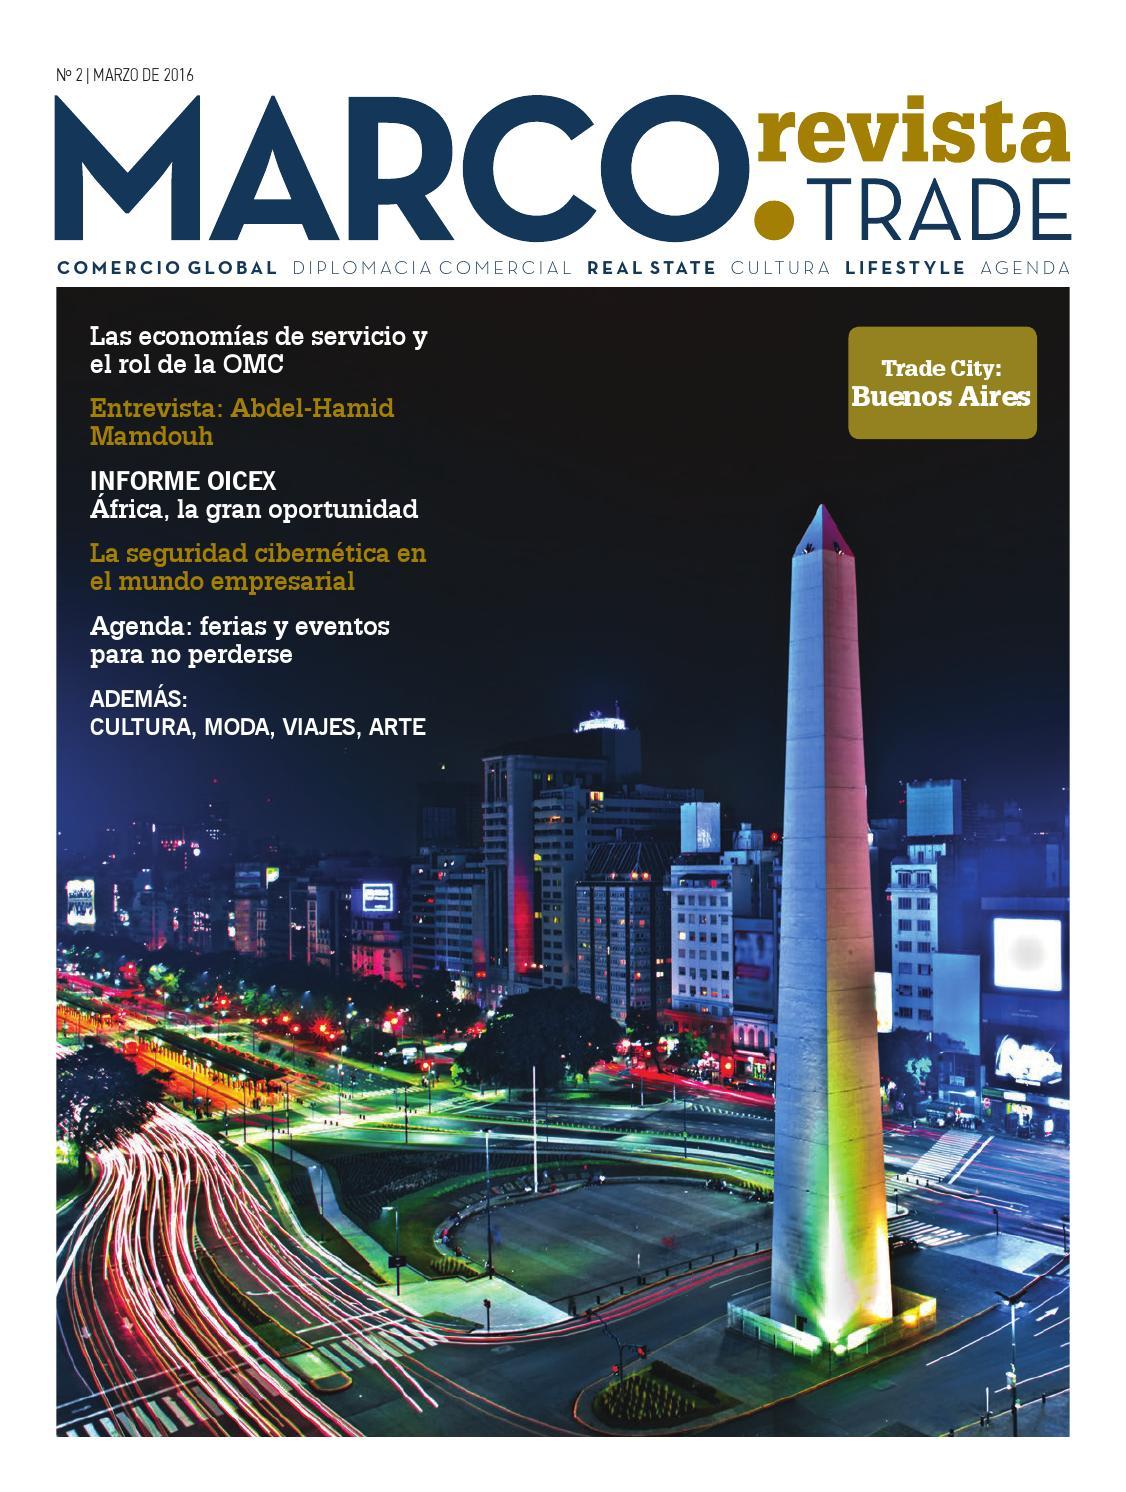 Marco Trade Revista Numero 2 by MARCO TRADE REVISTA - issuu